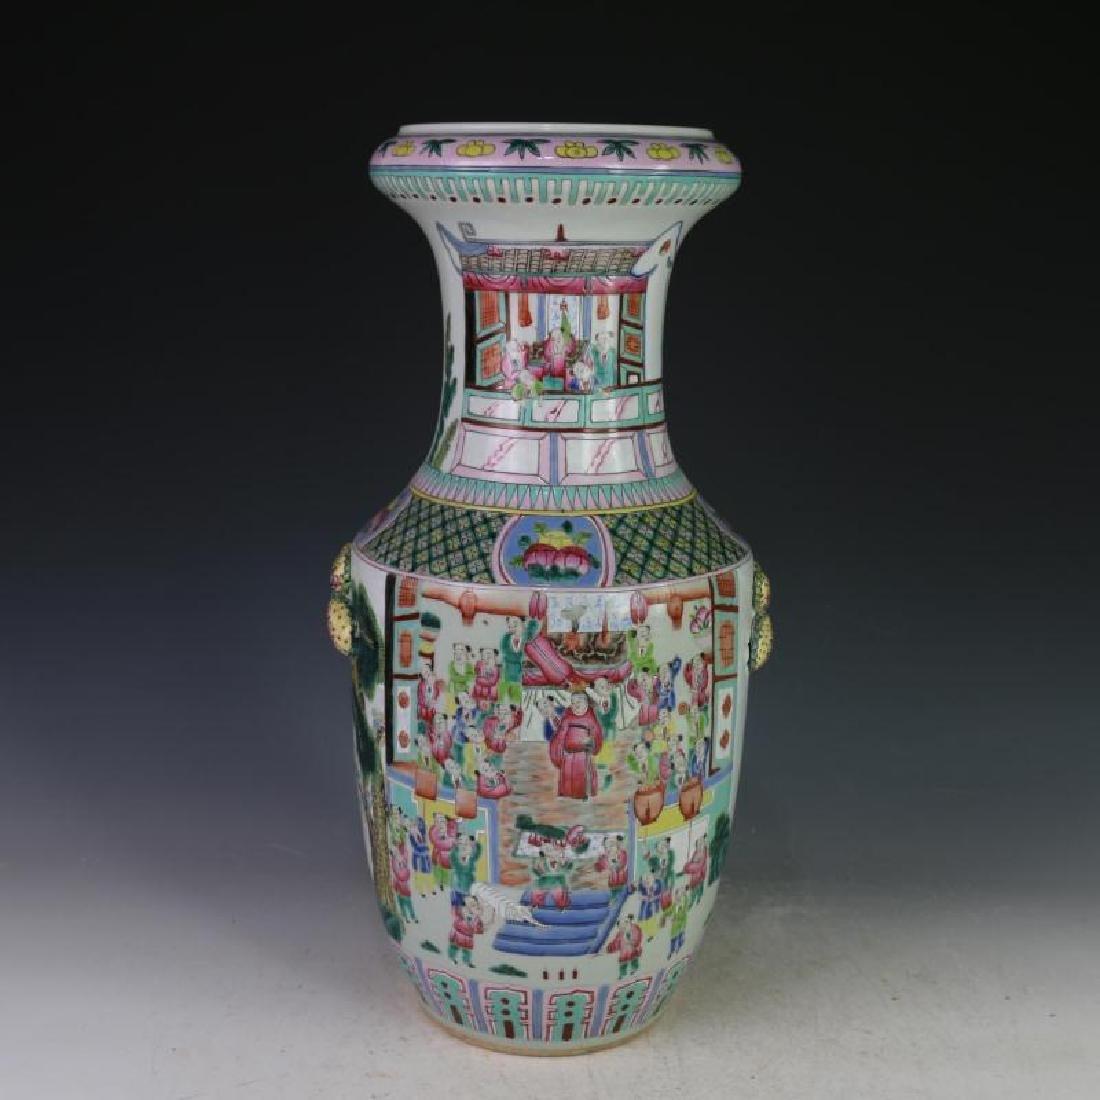 Chinese Qing Dynasty Famille-Rose Porcelain Vase